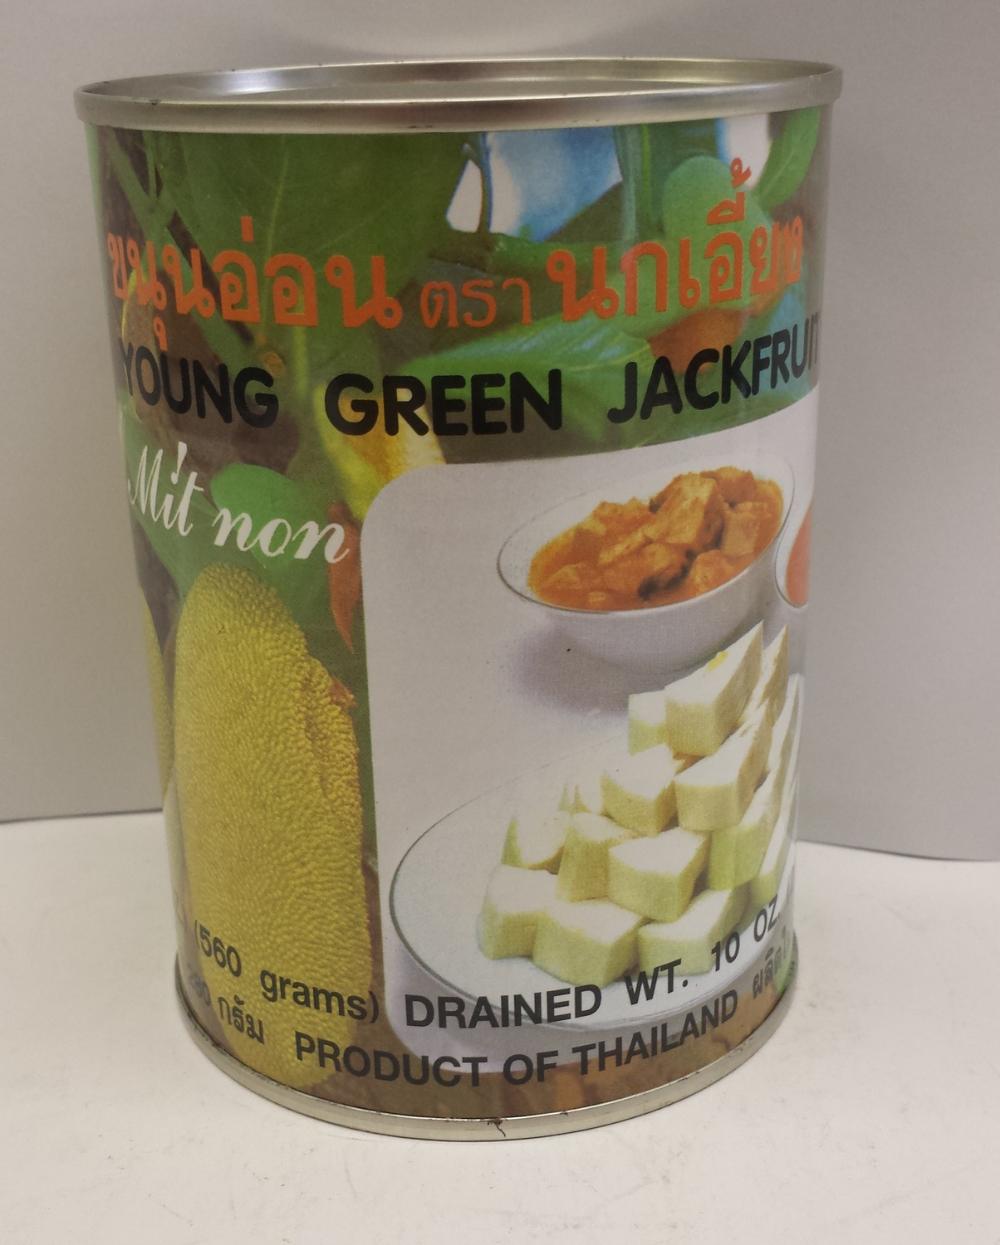 Young Green Jack fruit    Singing Bird   VC19100 24x20 oz